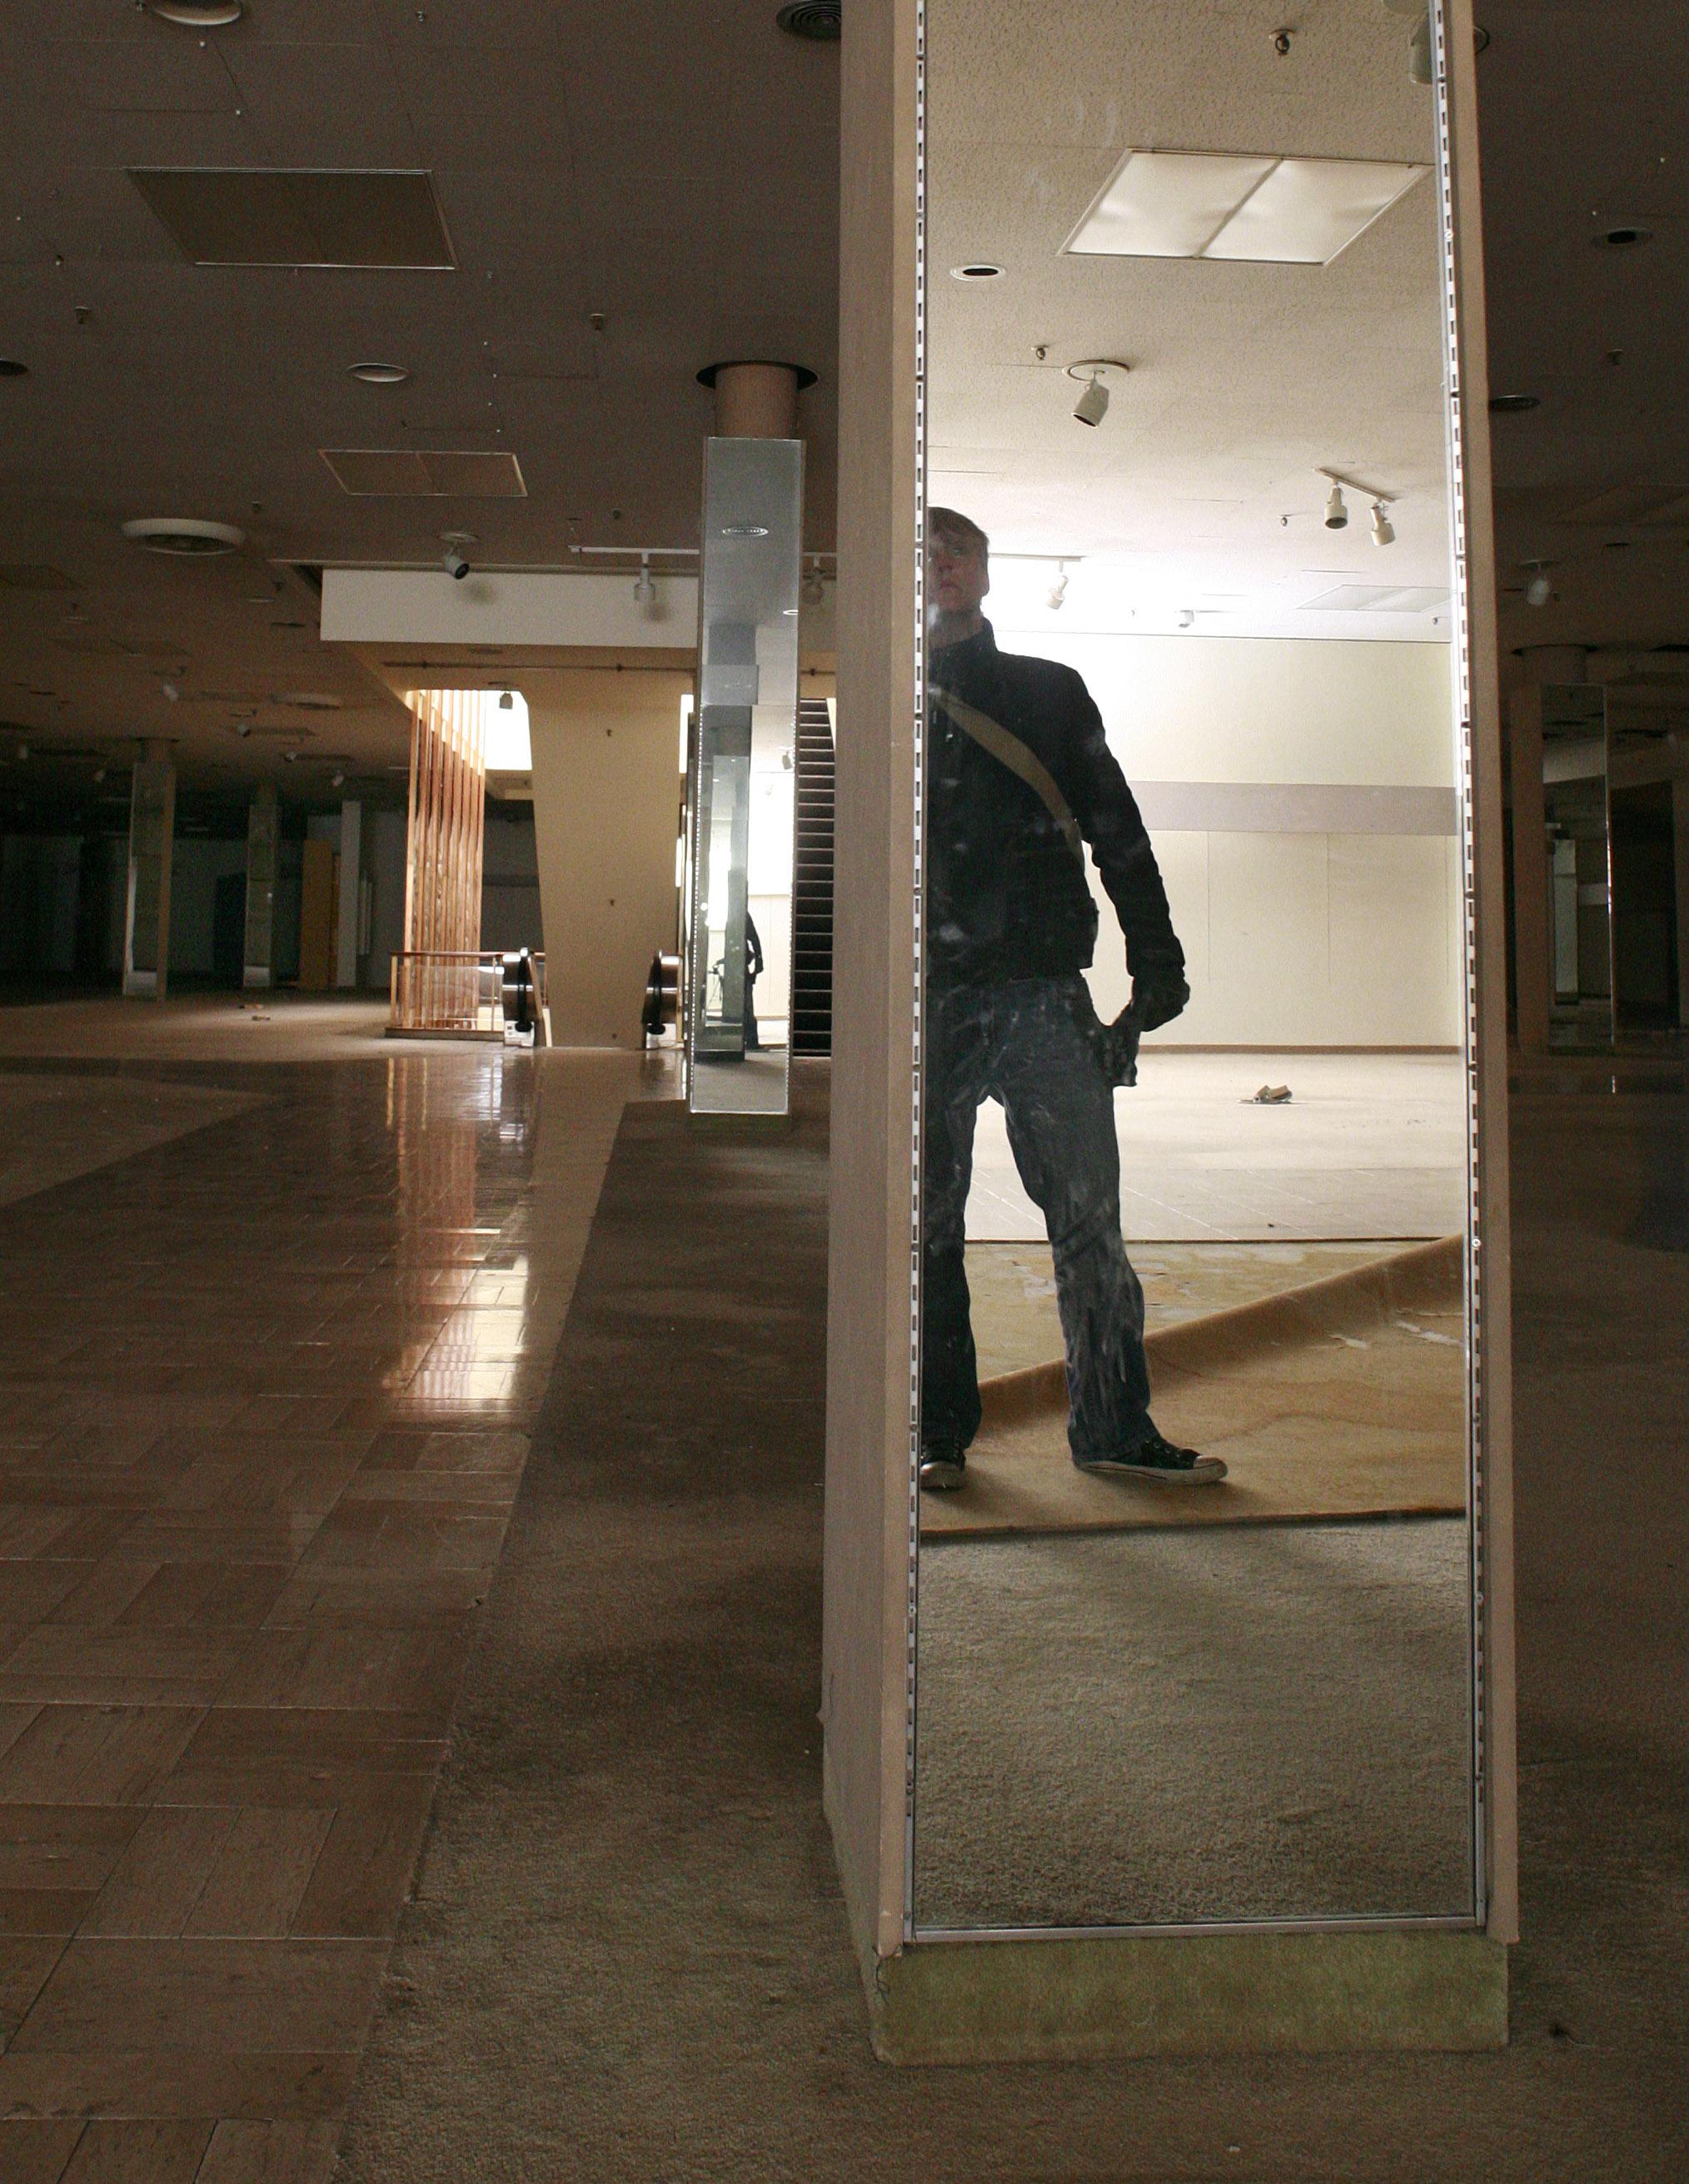 Self Portrait during Urban Exploration